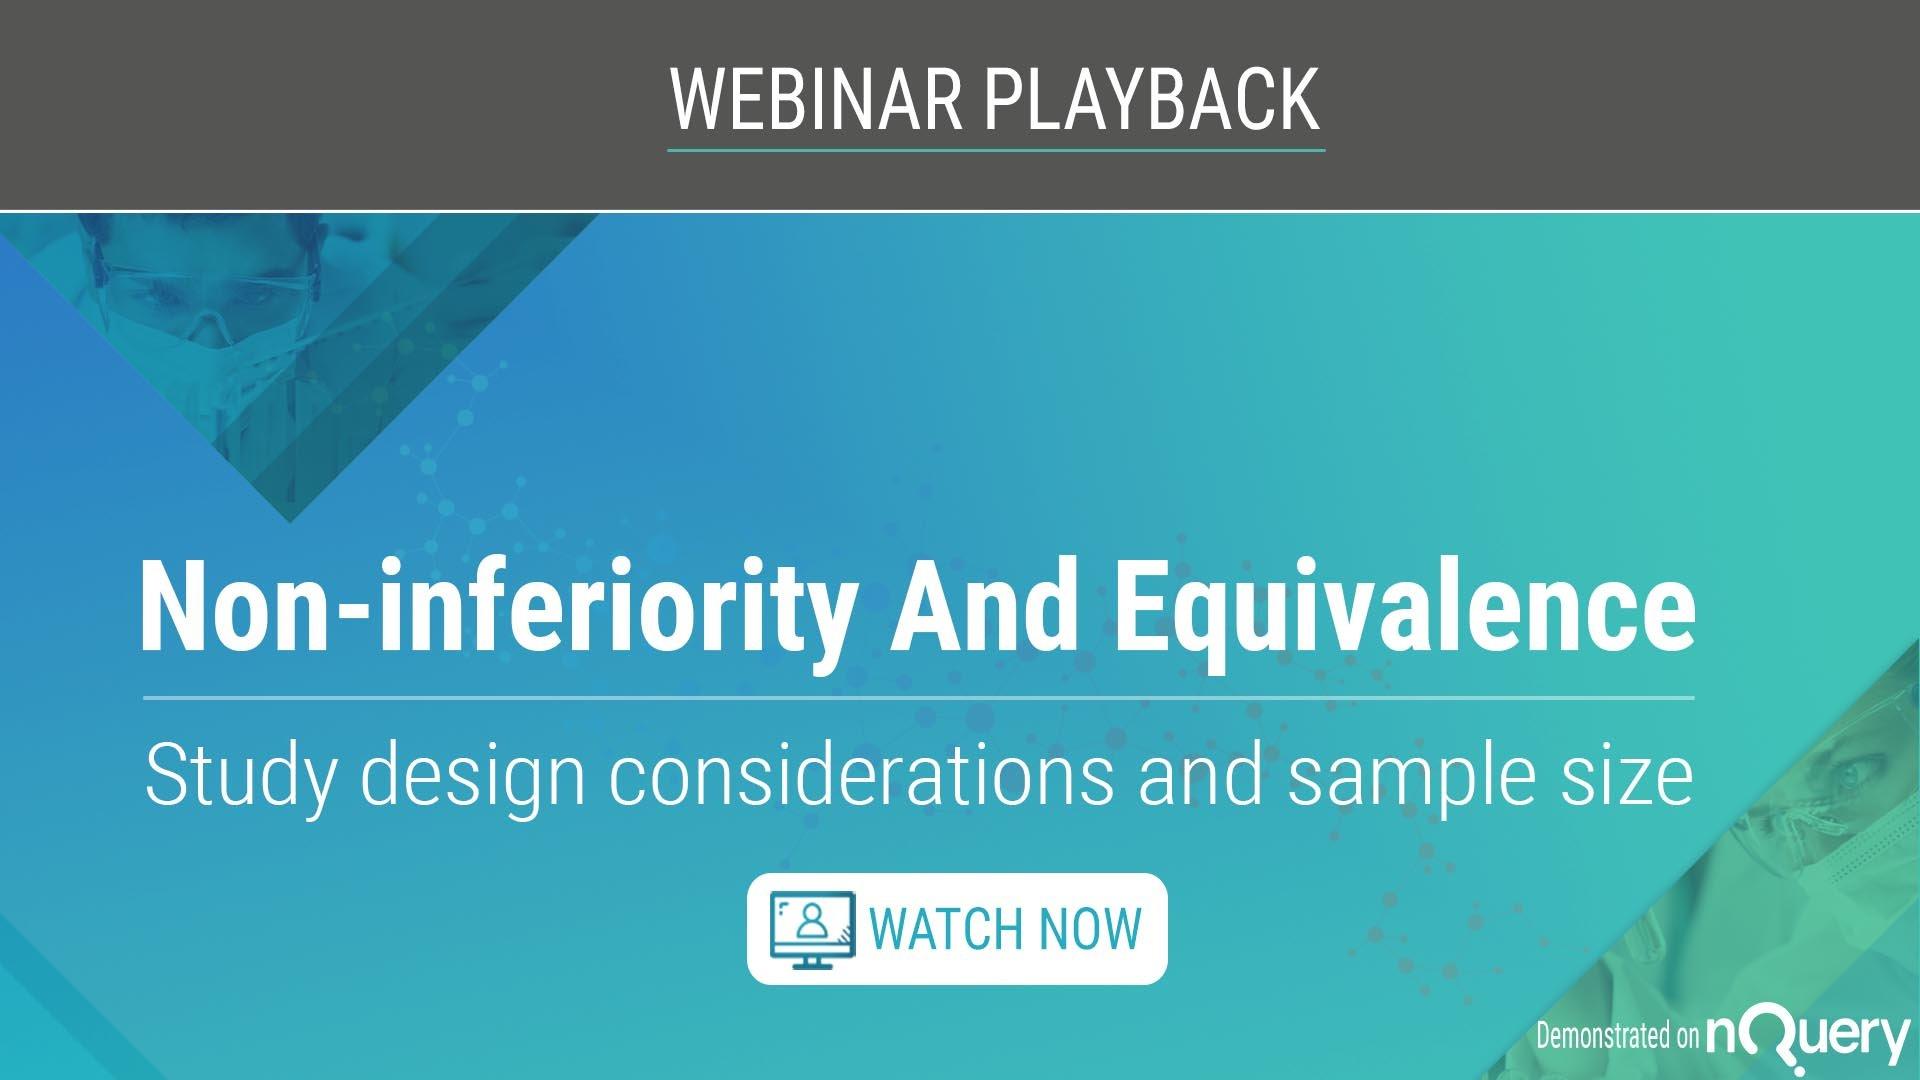 Non-inferiority-And-Equivalence-study-design-webinar-playback